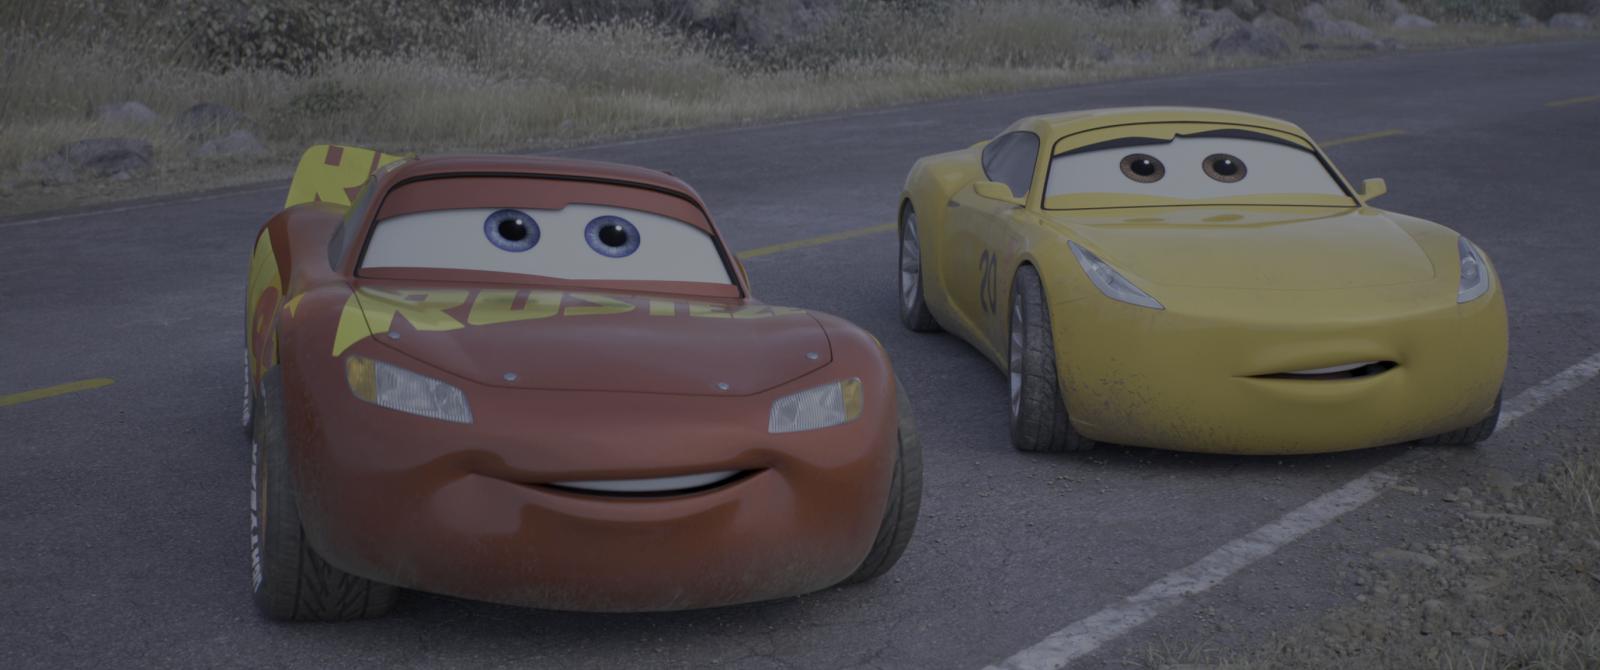 Cars 3 (2017) 4K UHD [HDR] Latino – Castellano – Ingles captura 4